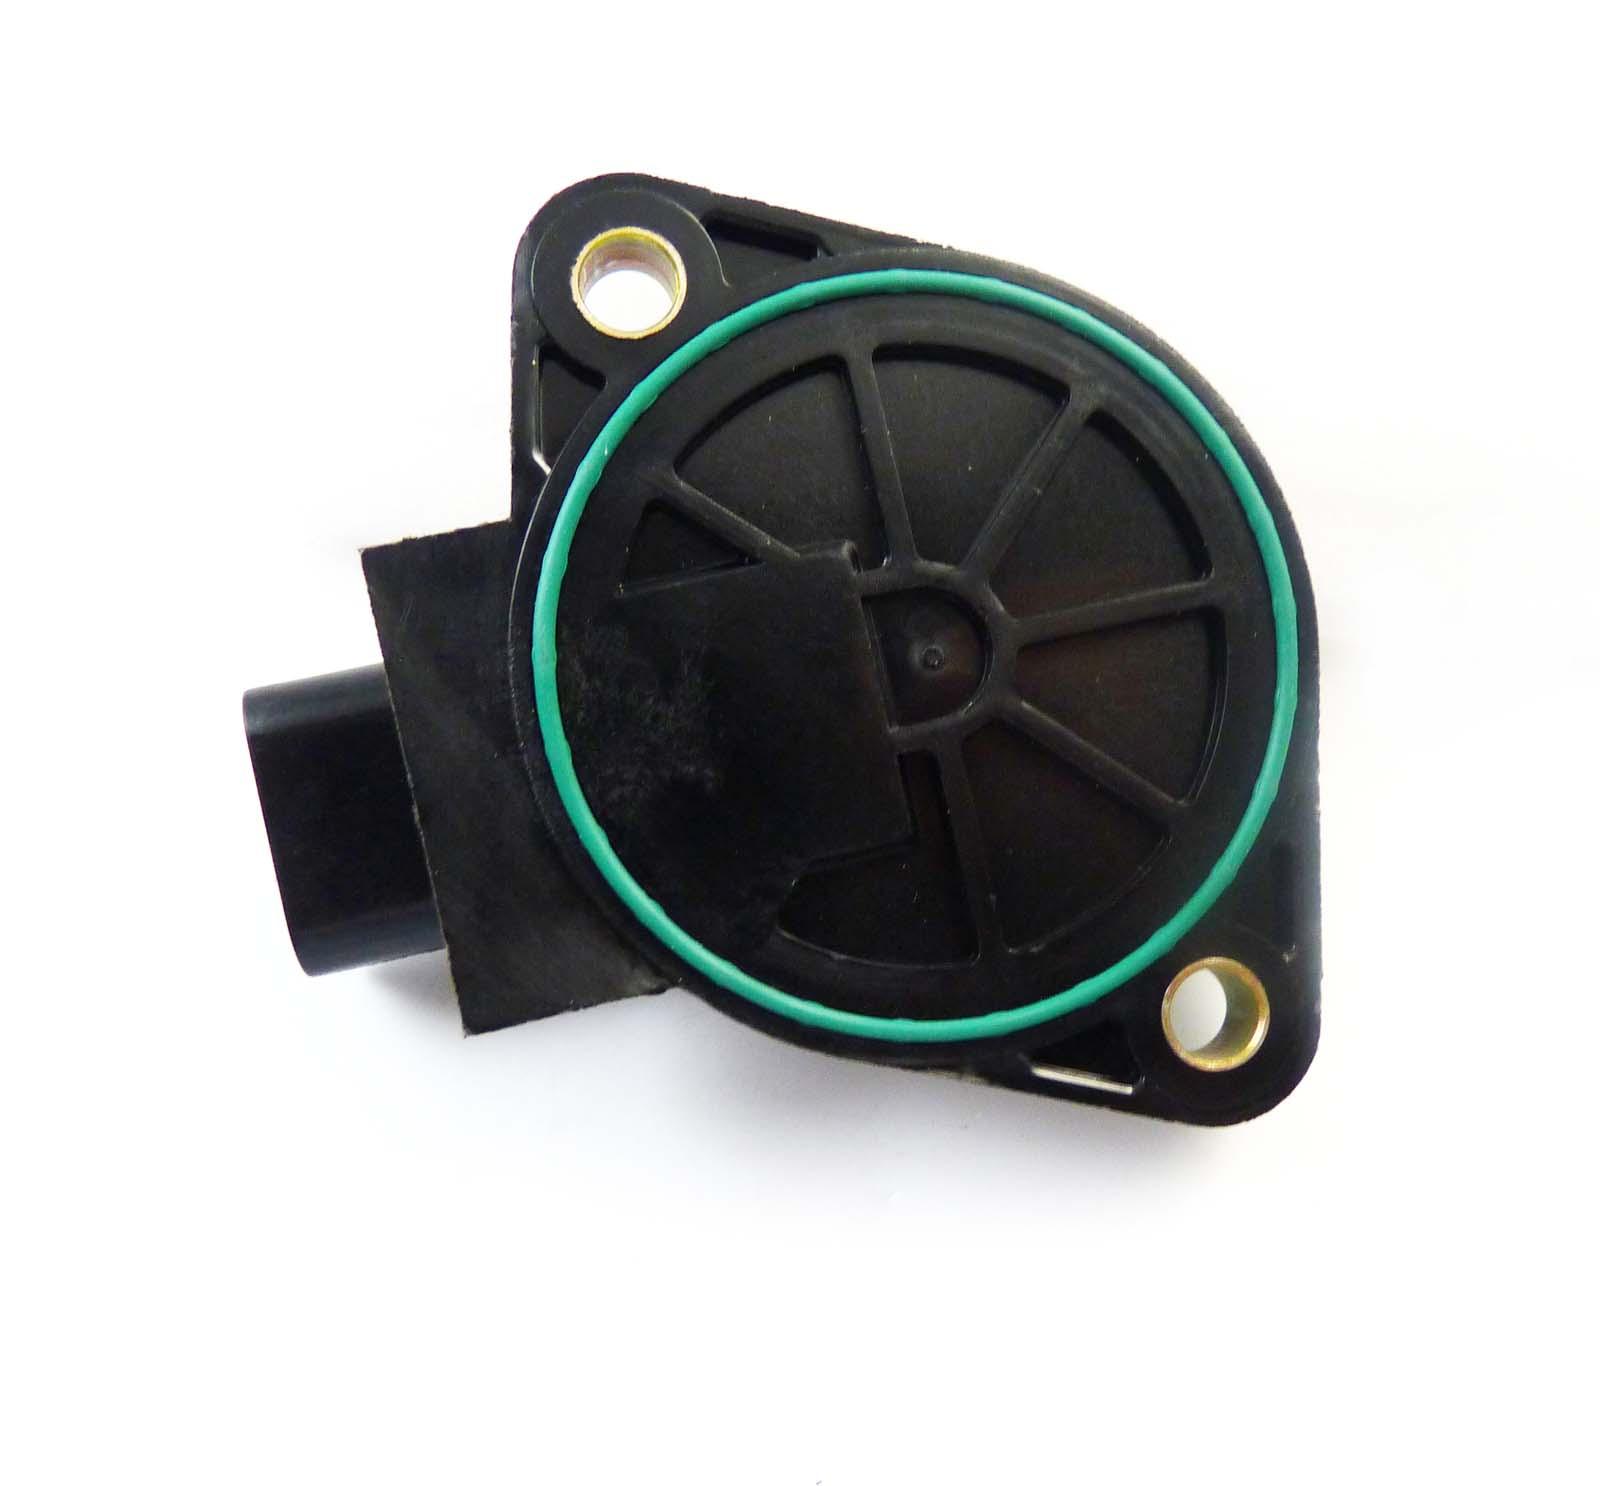 For Cam shaft Position Sensor for Chrysler PT Cruiser Dodge PC475 5S1261 SU3019